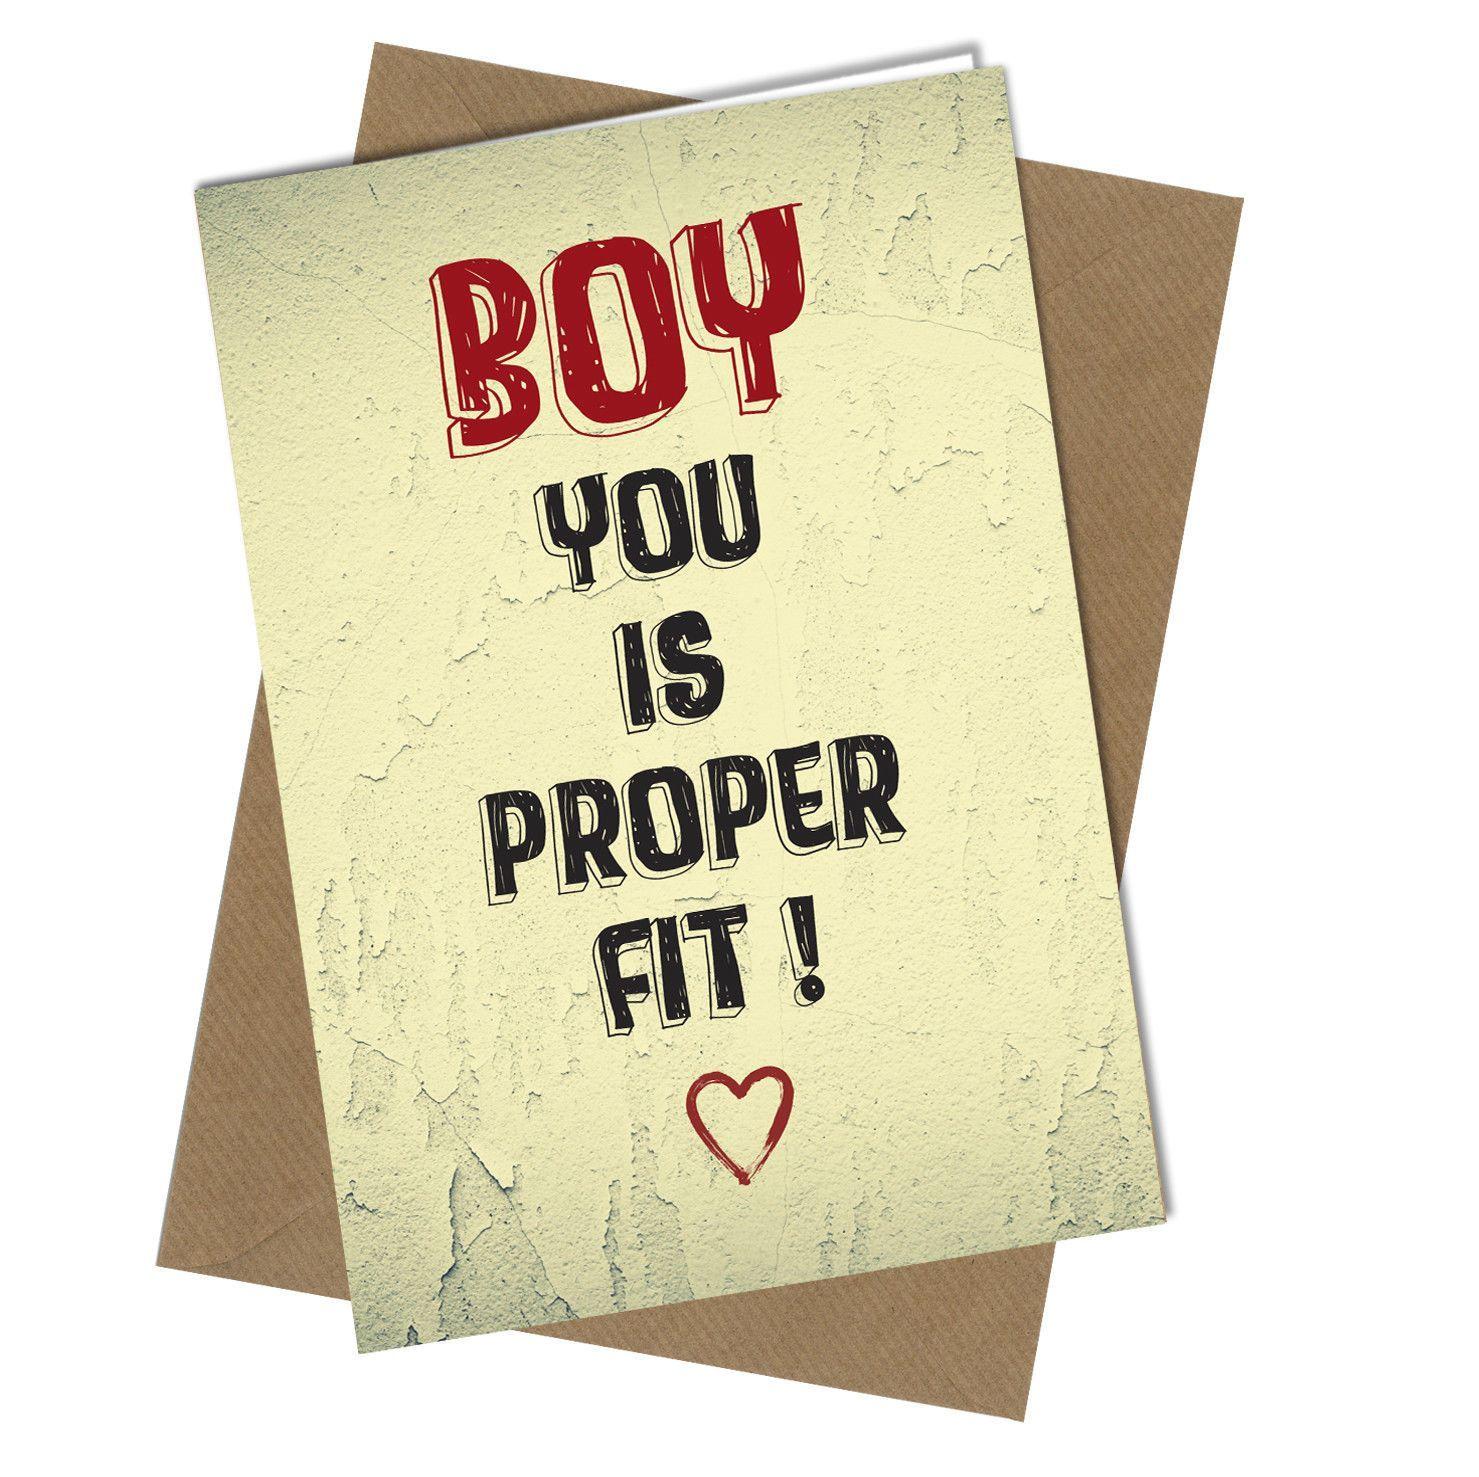 #858 Proper Fit Boy